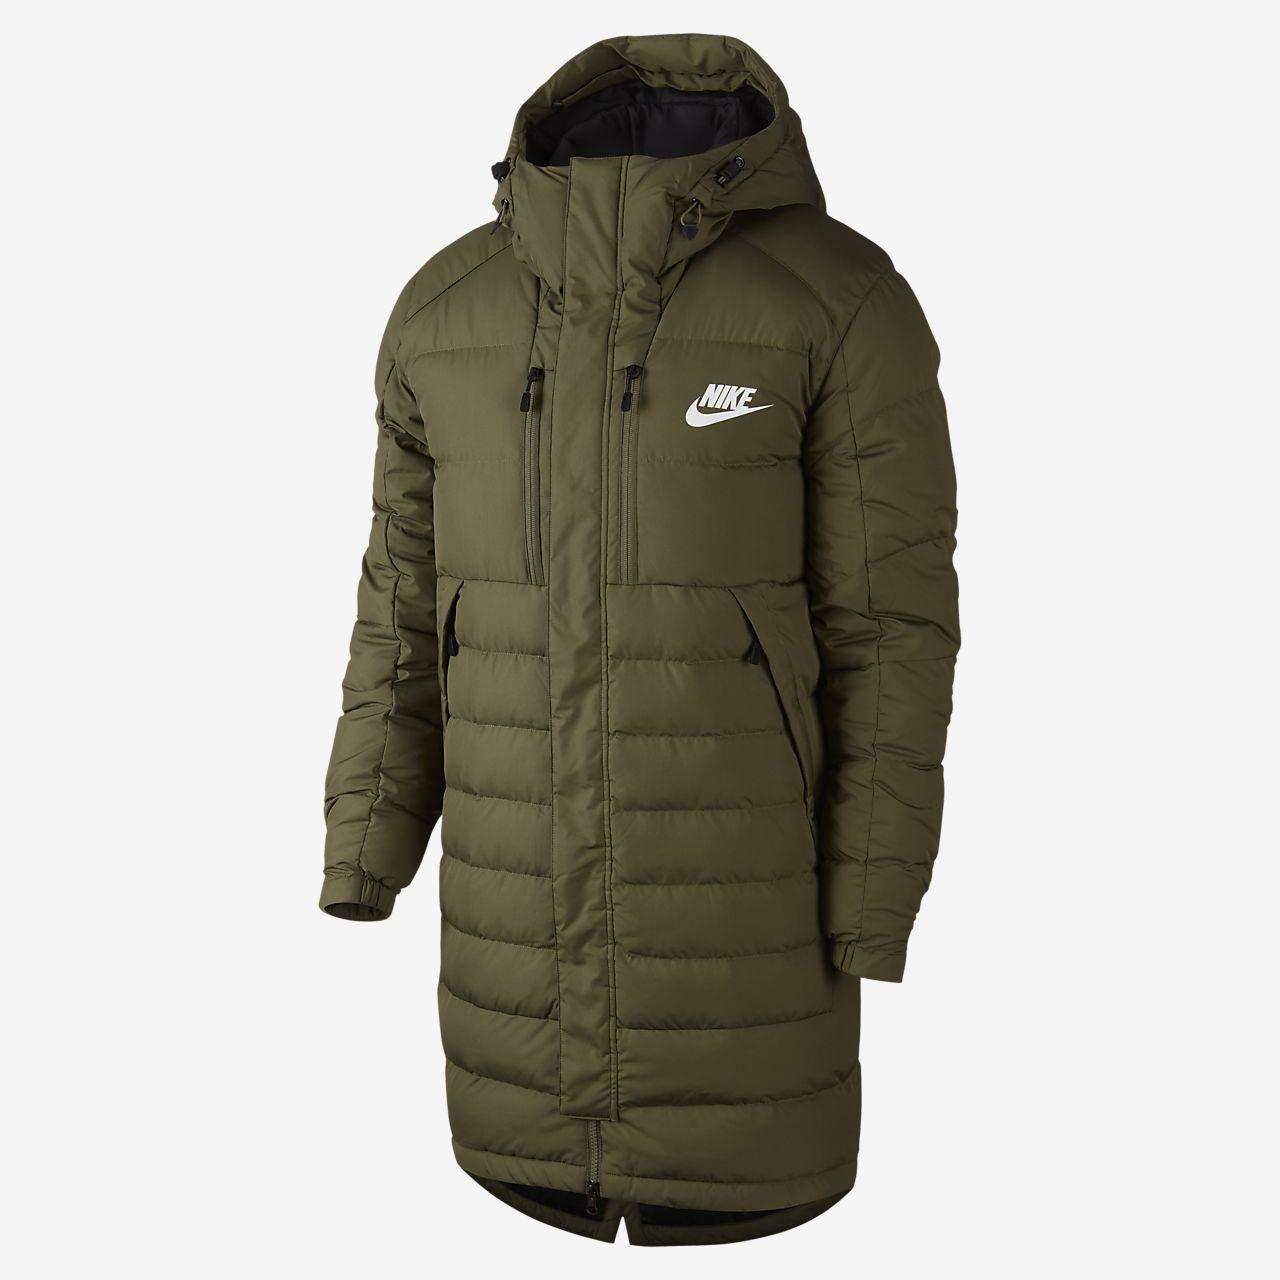 Nike Sportswear Parka 男子羽绒夹克